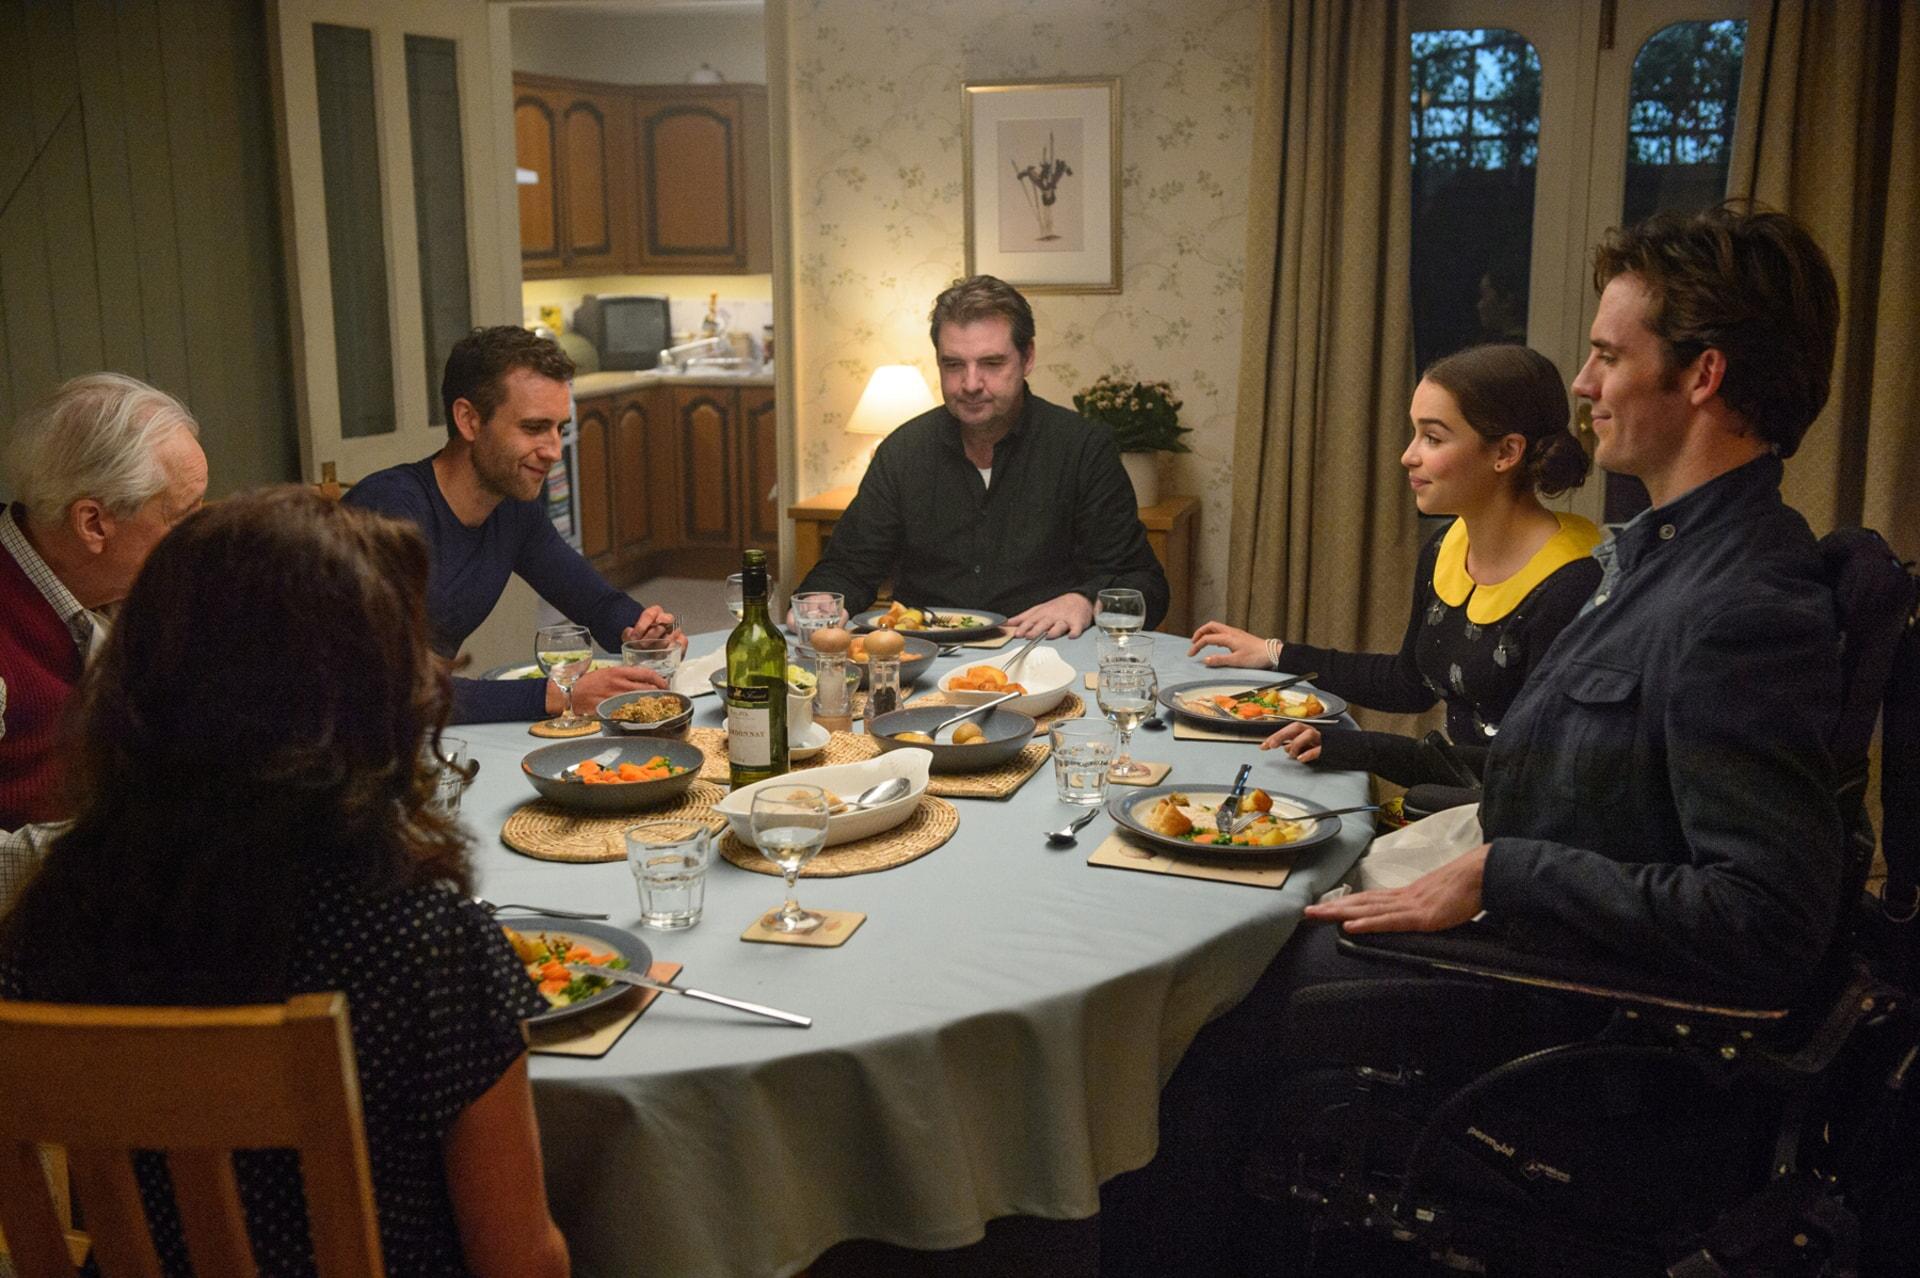 SAM CLAFLIN as Will Traynor, EMILIA CLARKE as Lou Clark, BRENDAN COYLE as Bernard Clark and MATTHEW LEWIS as Patrick sitting at a family-style dinner.